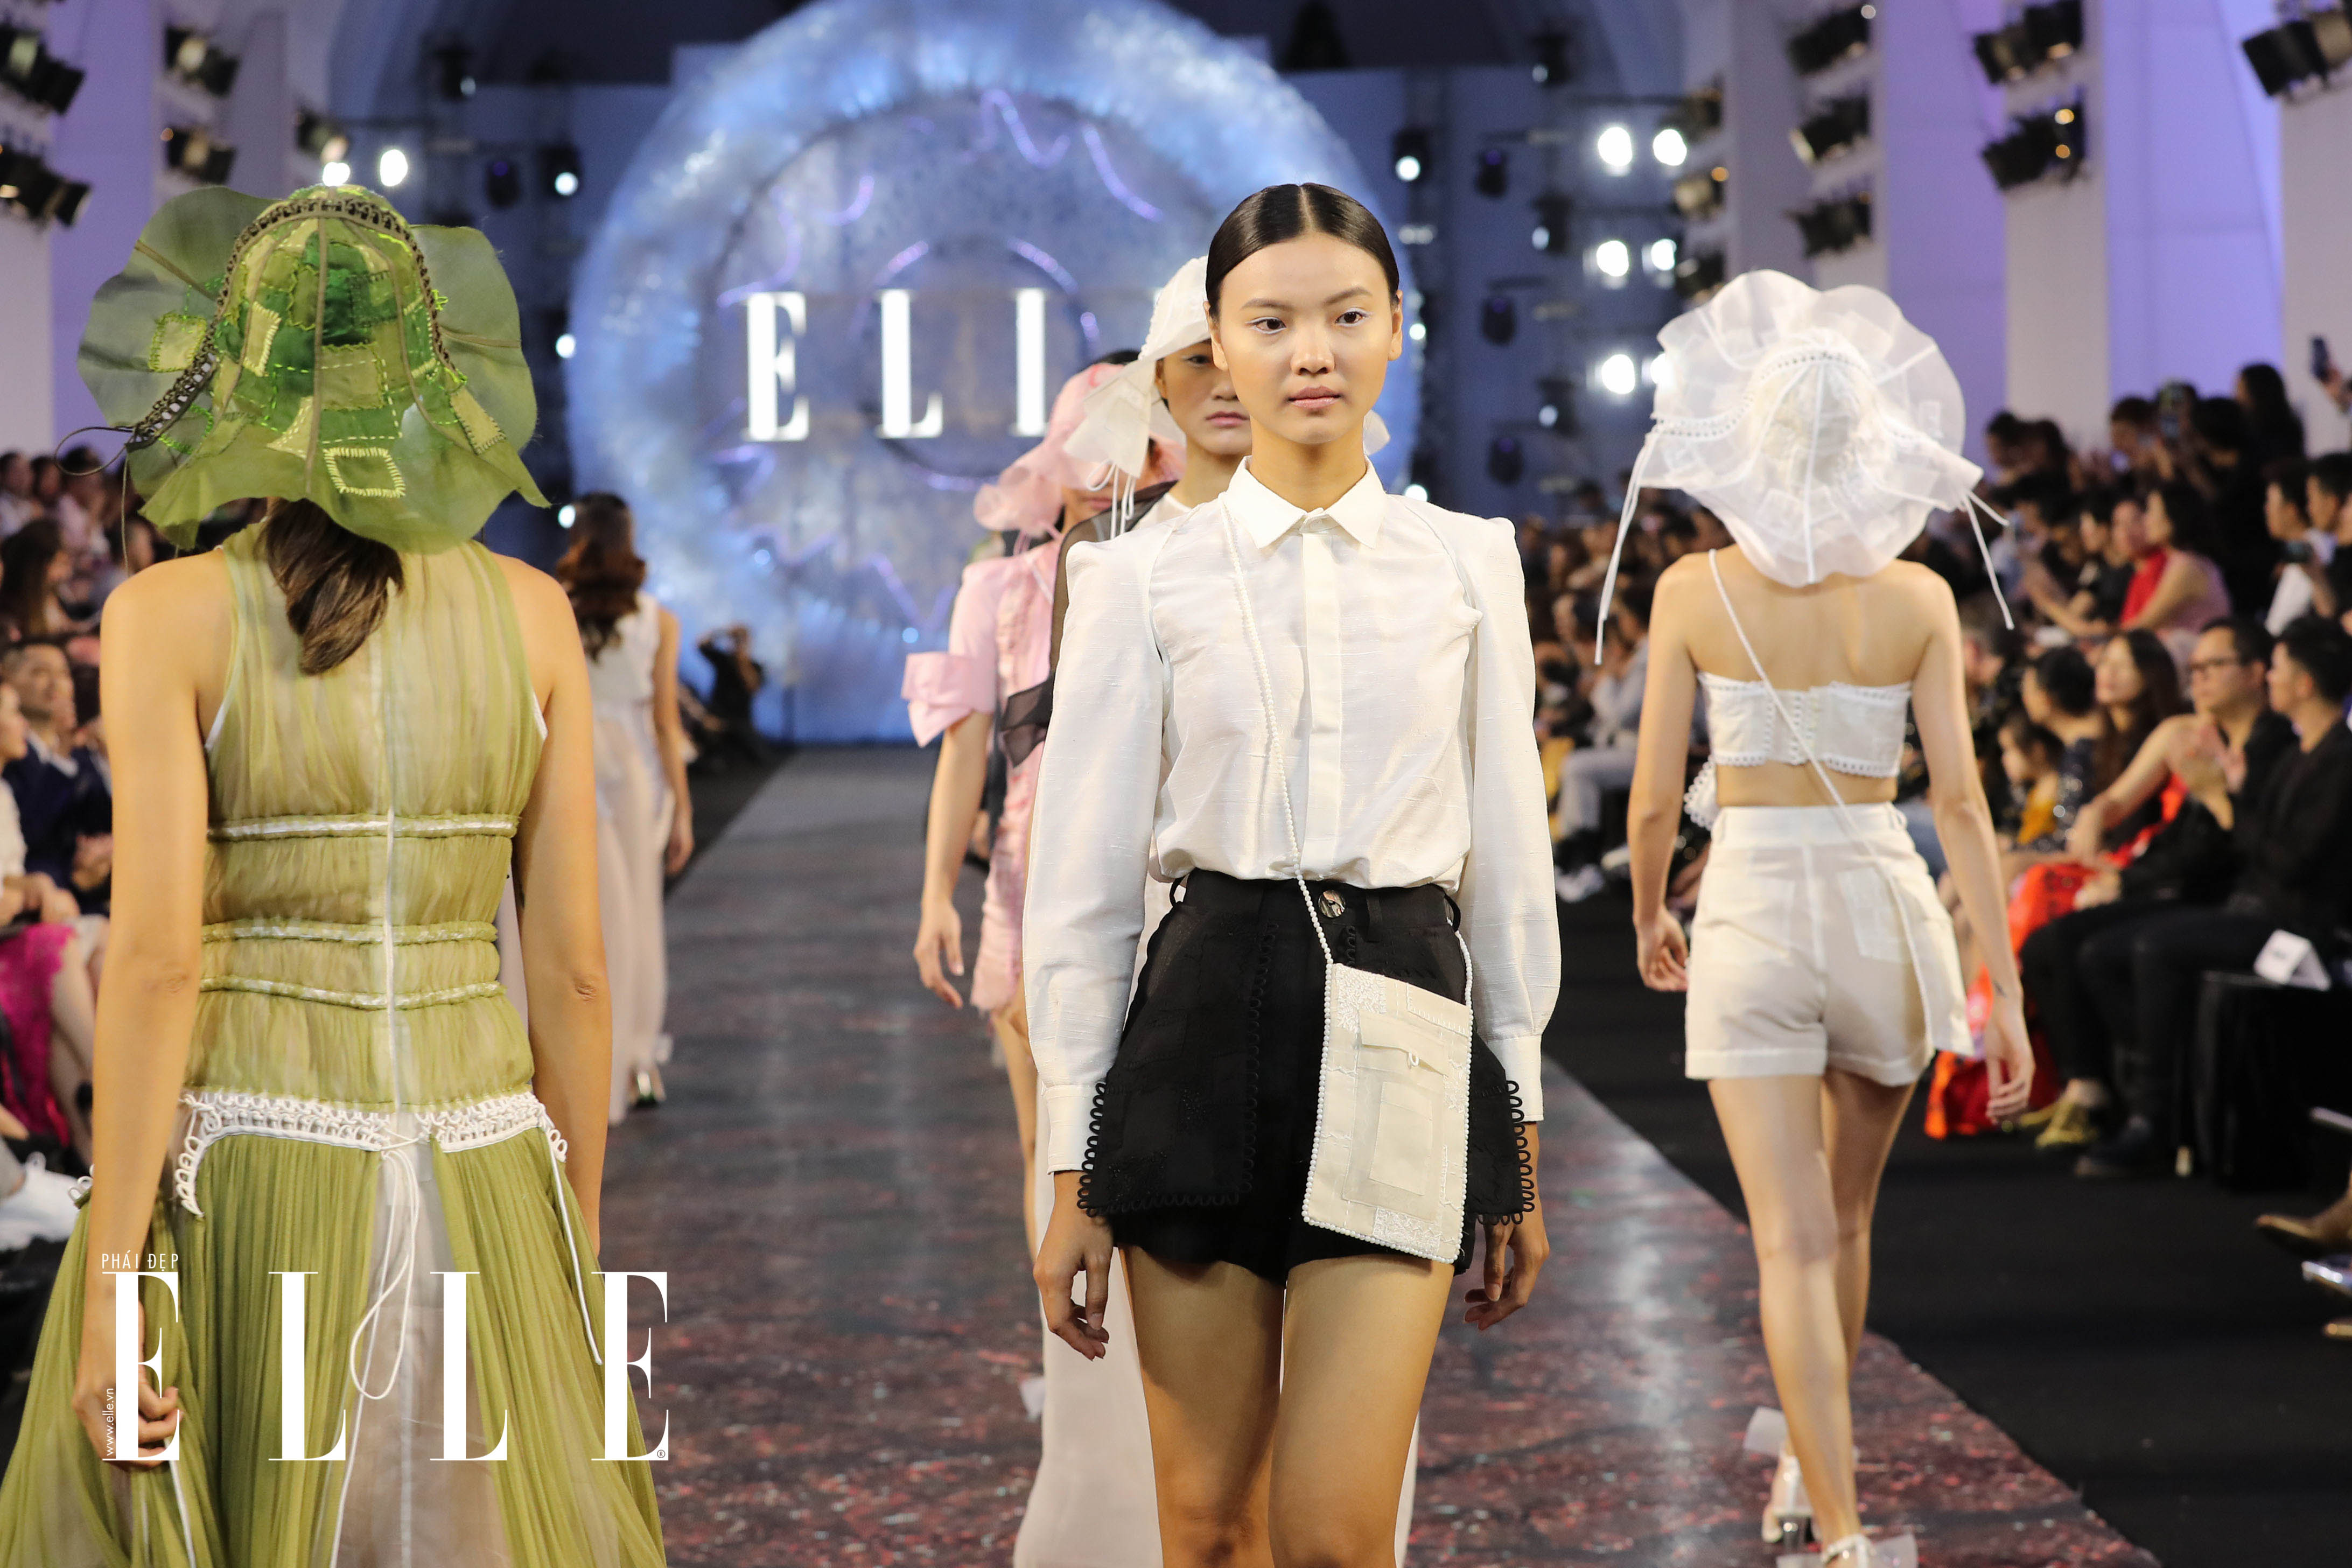 xu huong trang tu nhien diem thong linh san dien elle fashion journey 2018 07